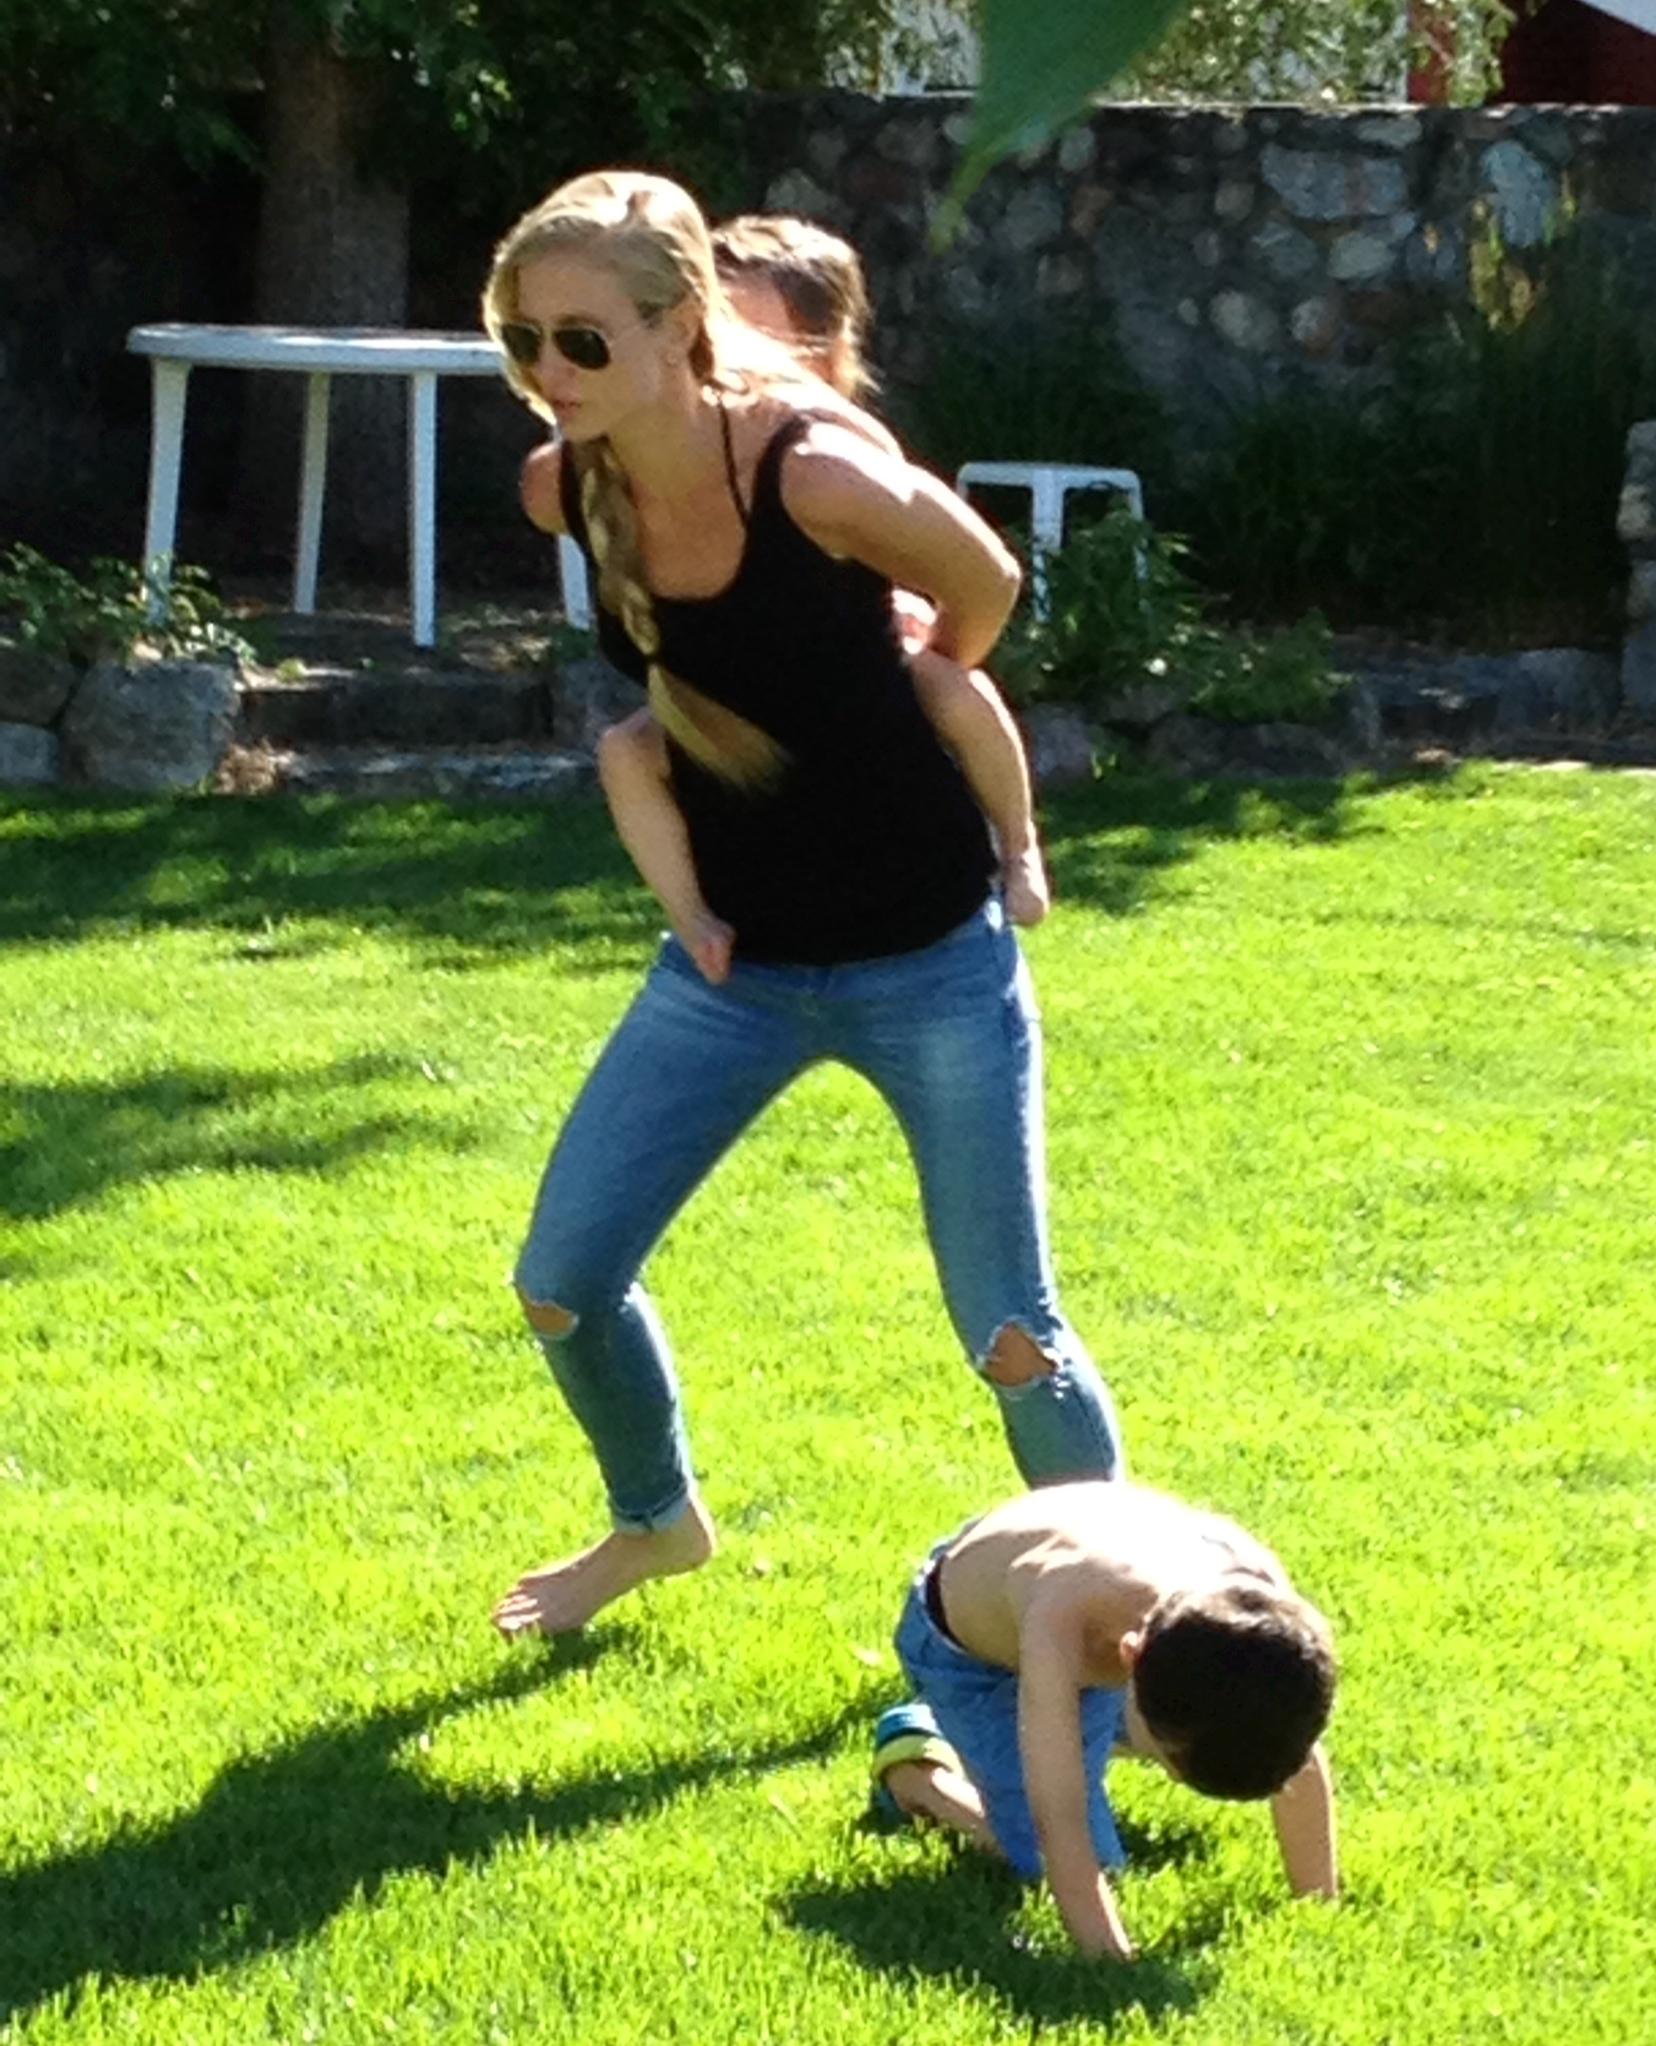 I Had a Boyhood Once, Too | The Huffington Post